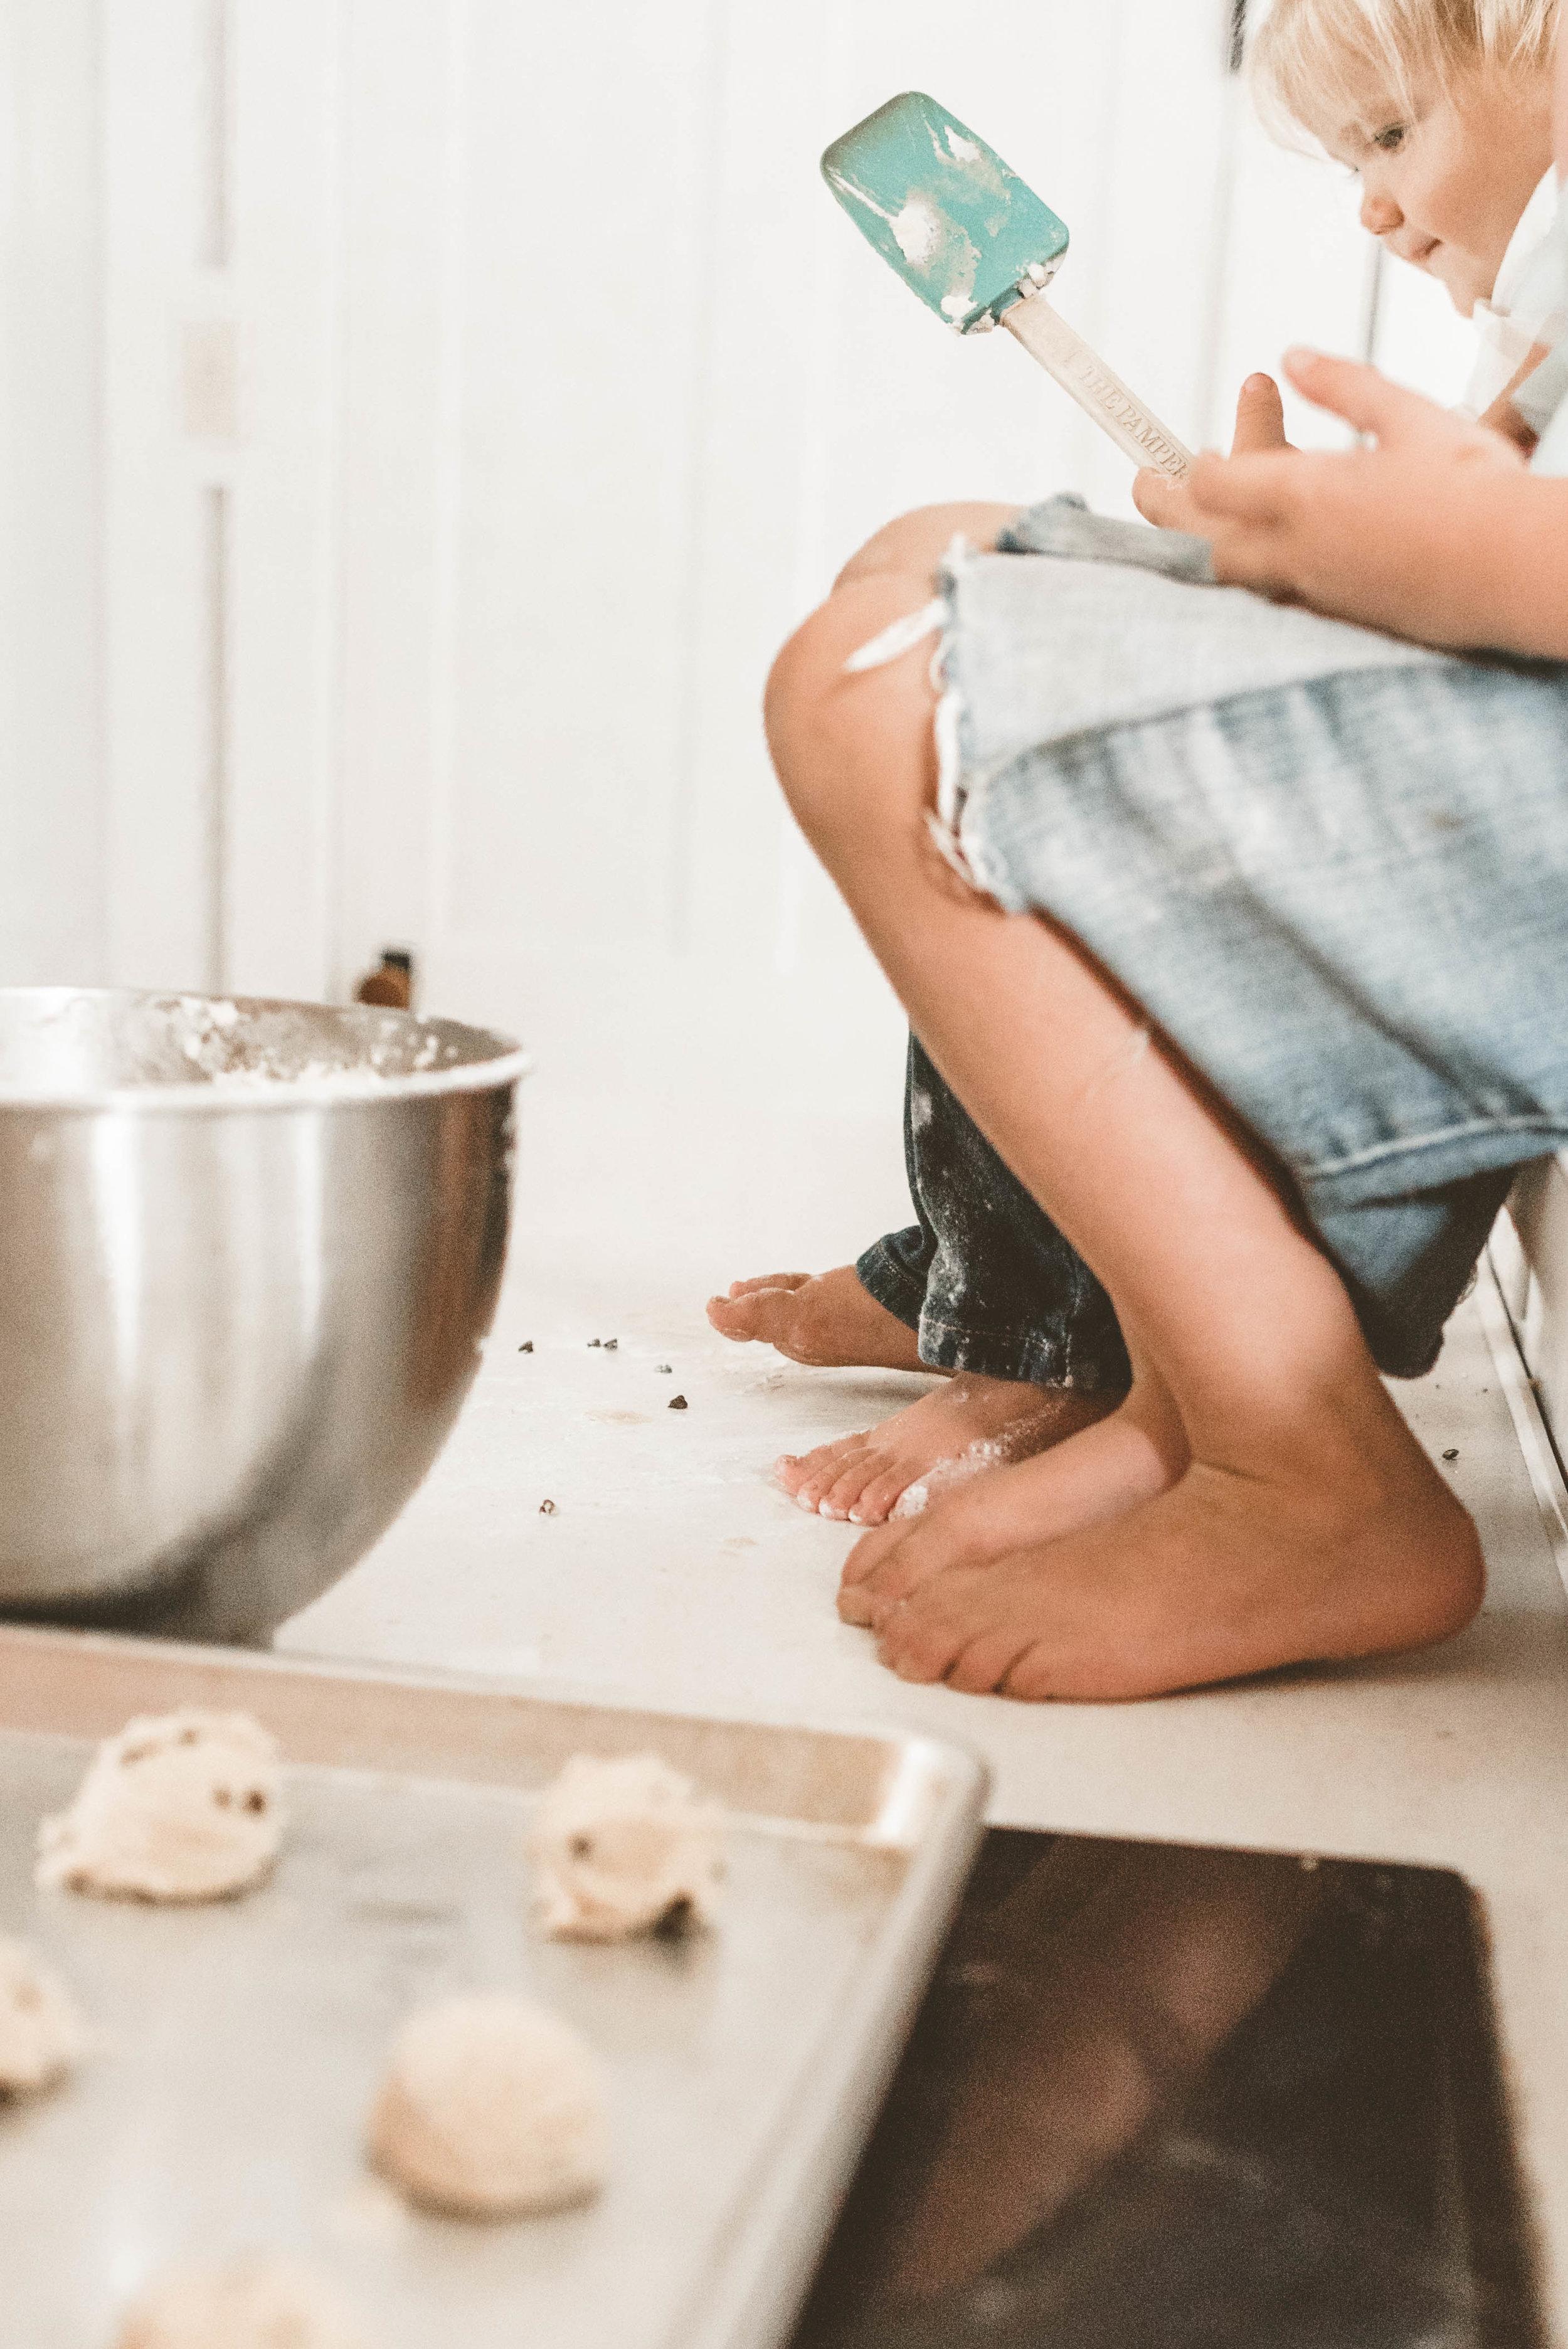 christi-stoner-photography-cookie-bake-2